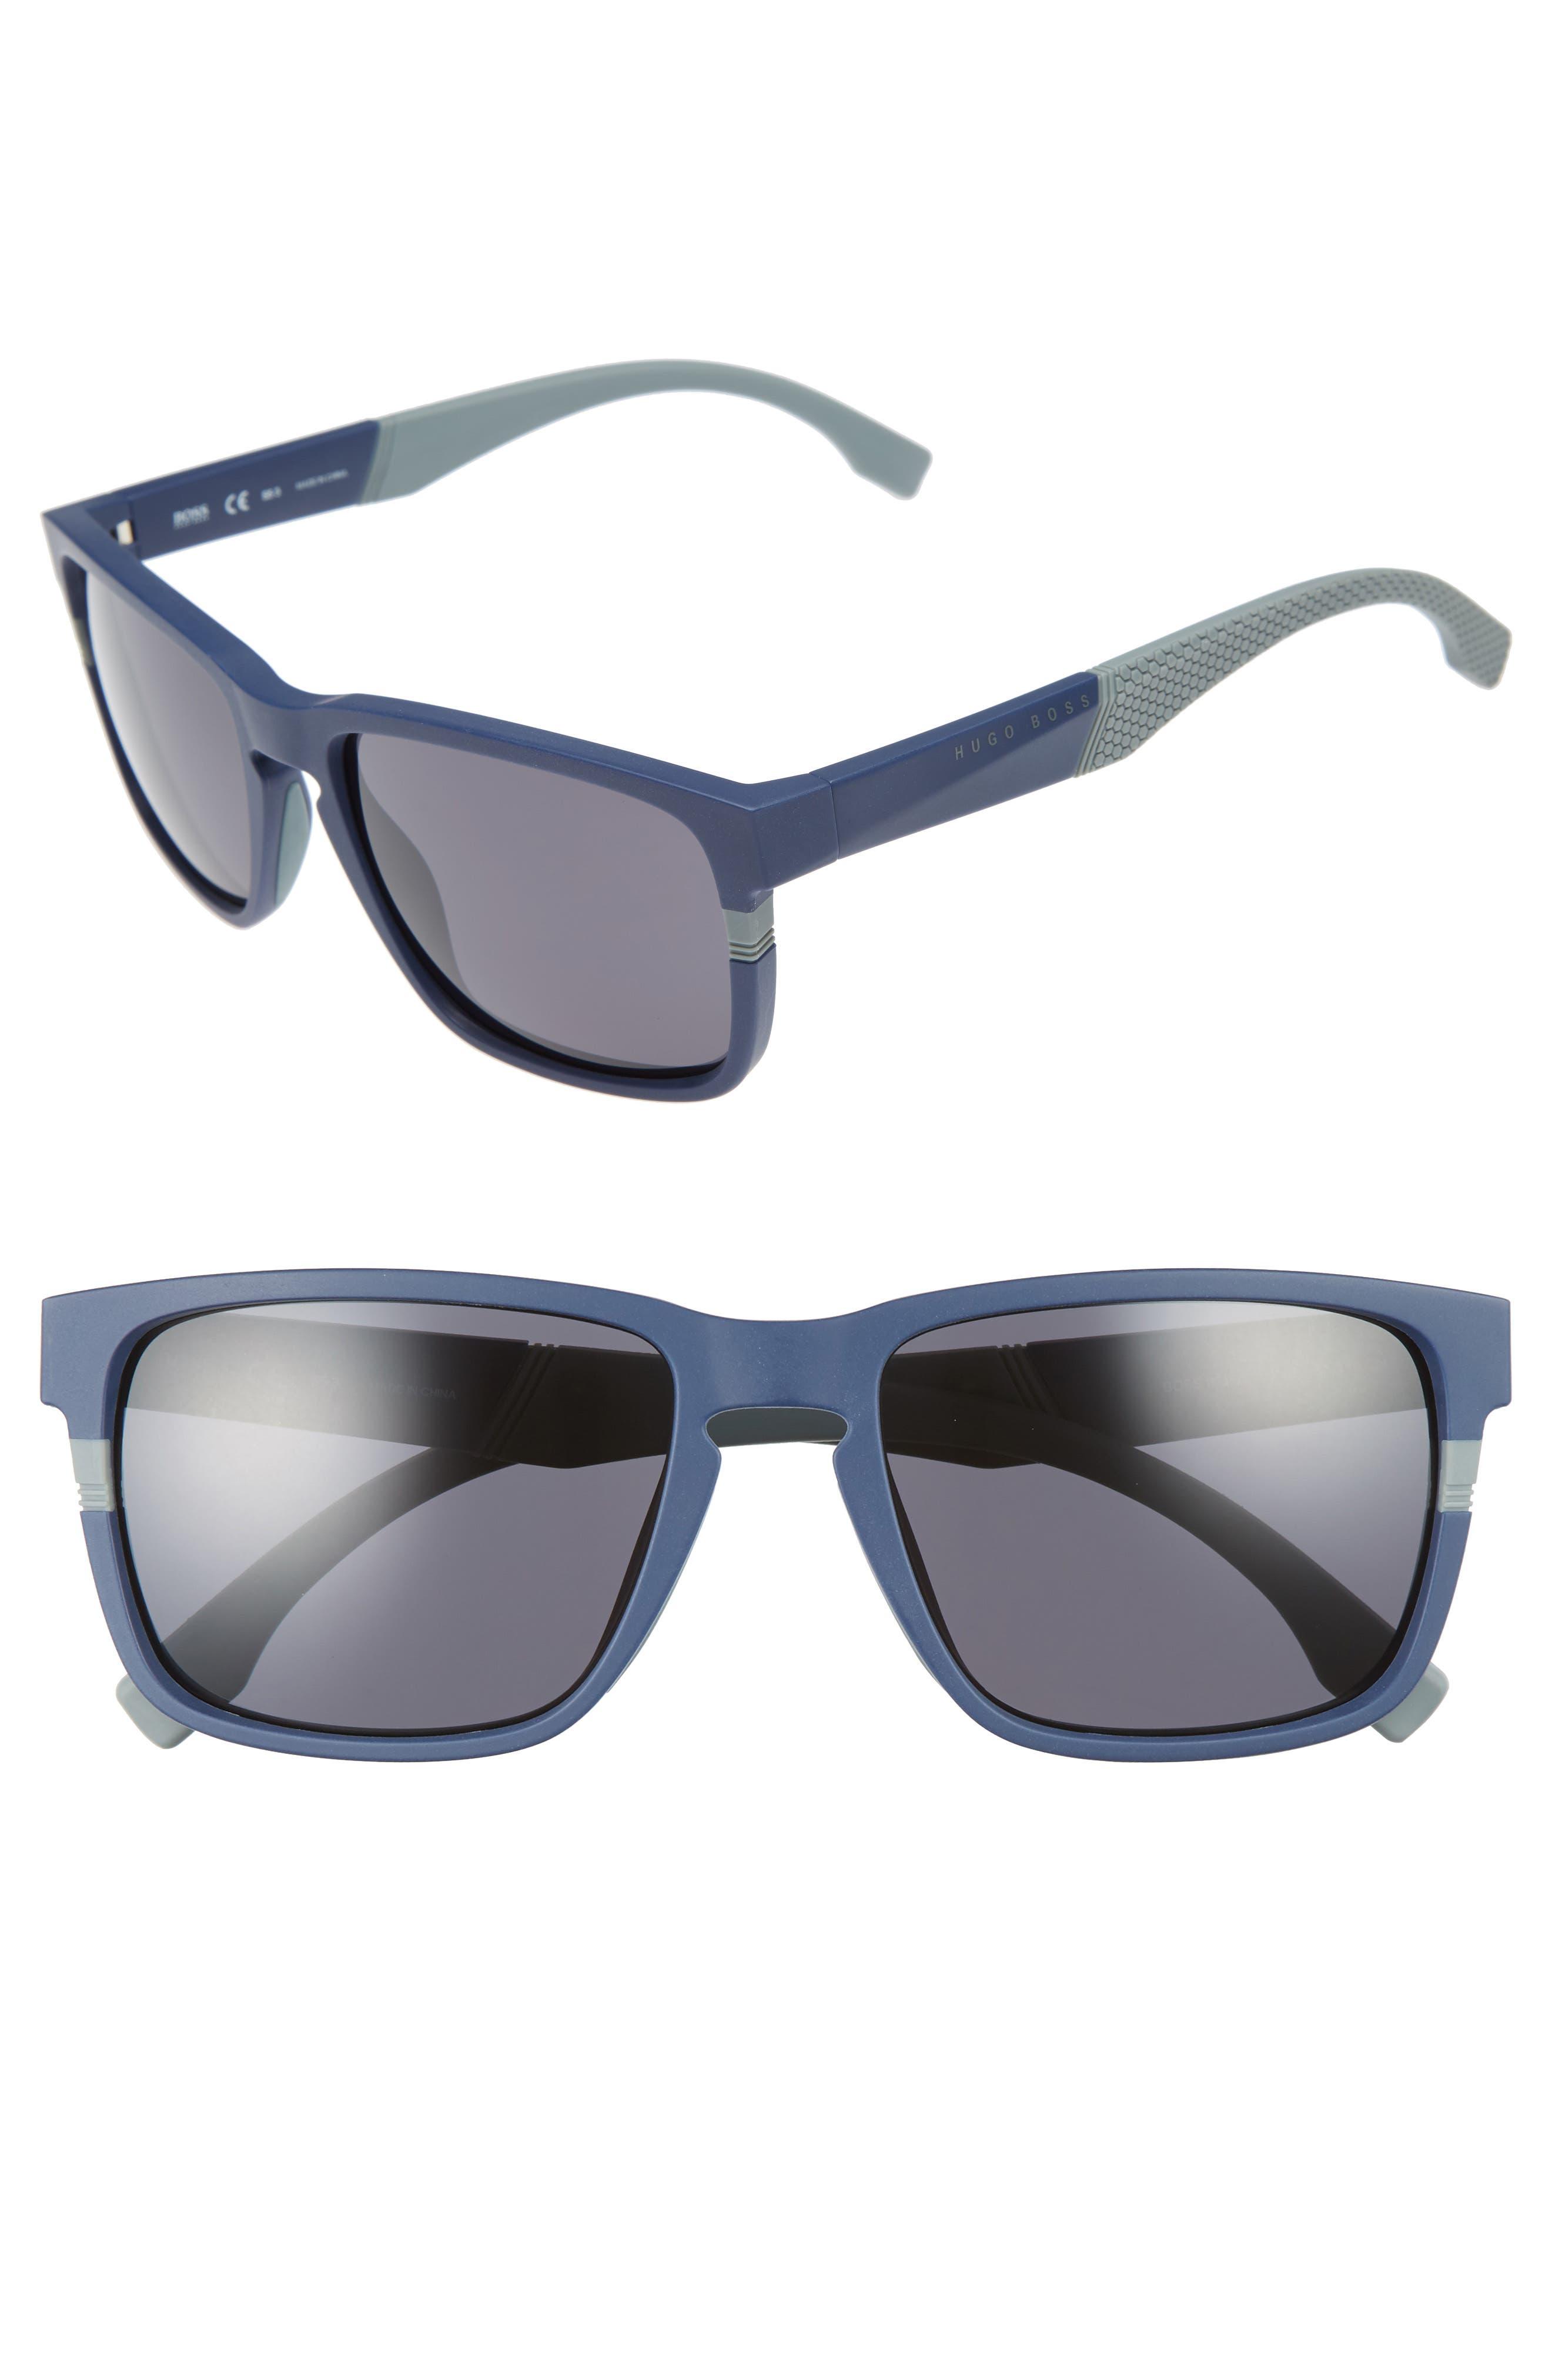 57mm Sunglasses,                         Main,                         color, BLUE/ GREY BLUE